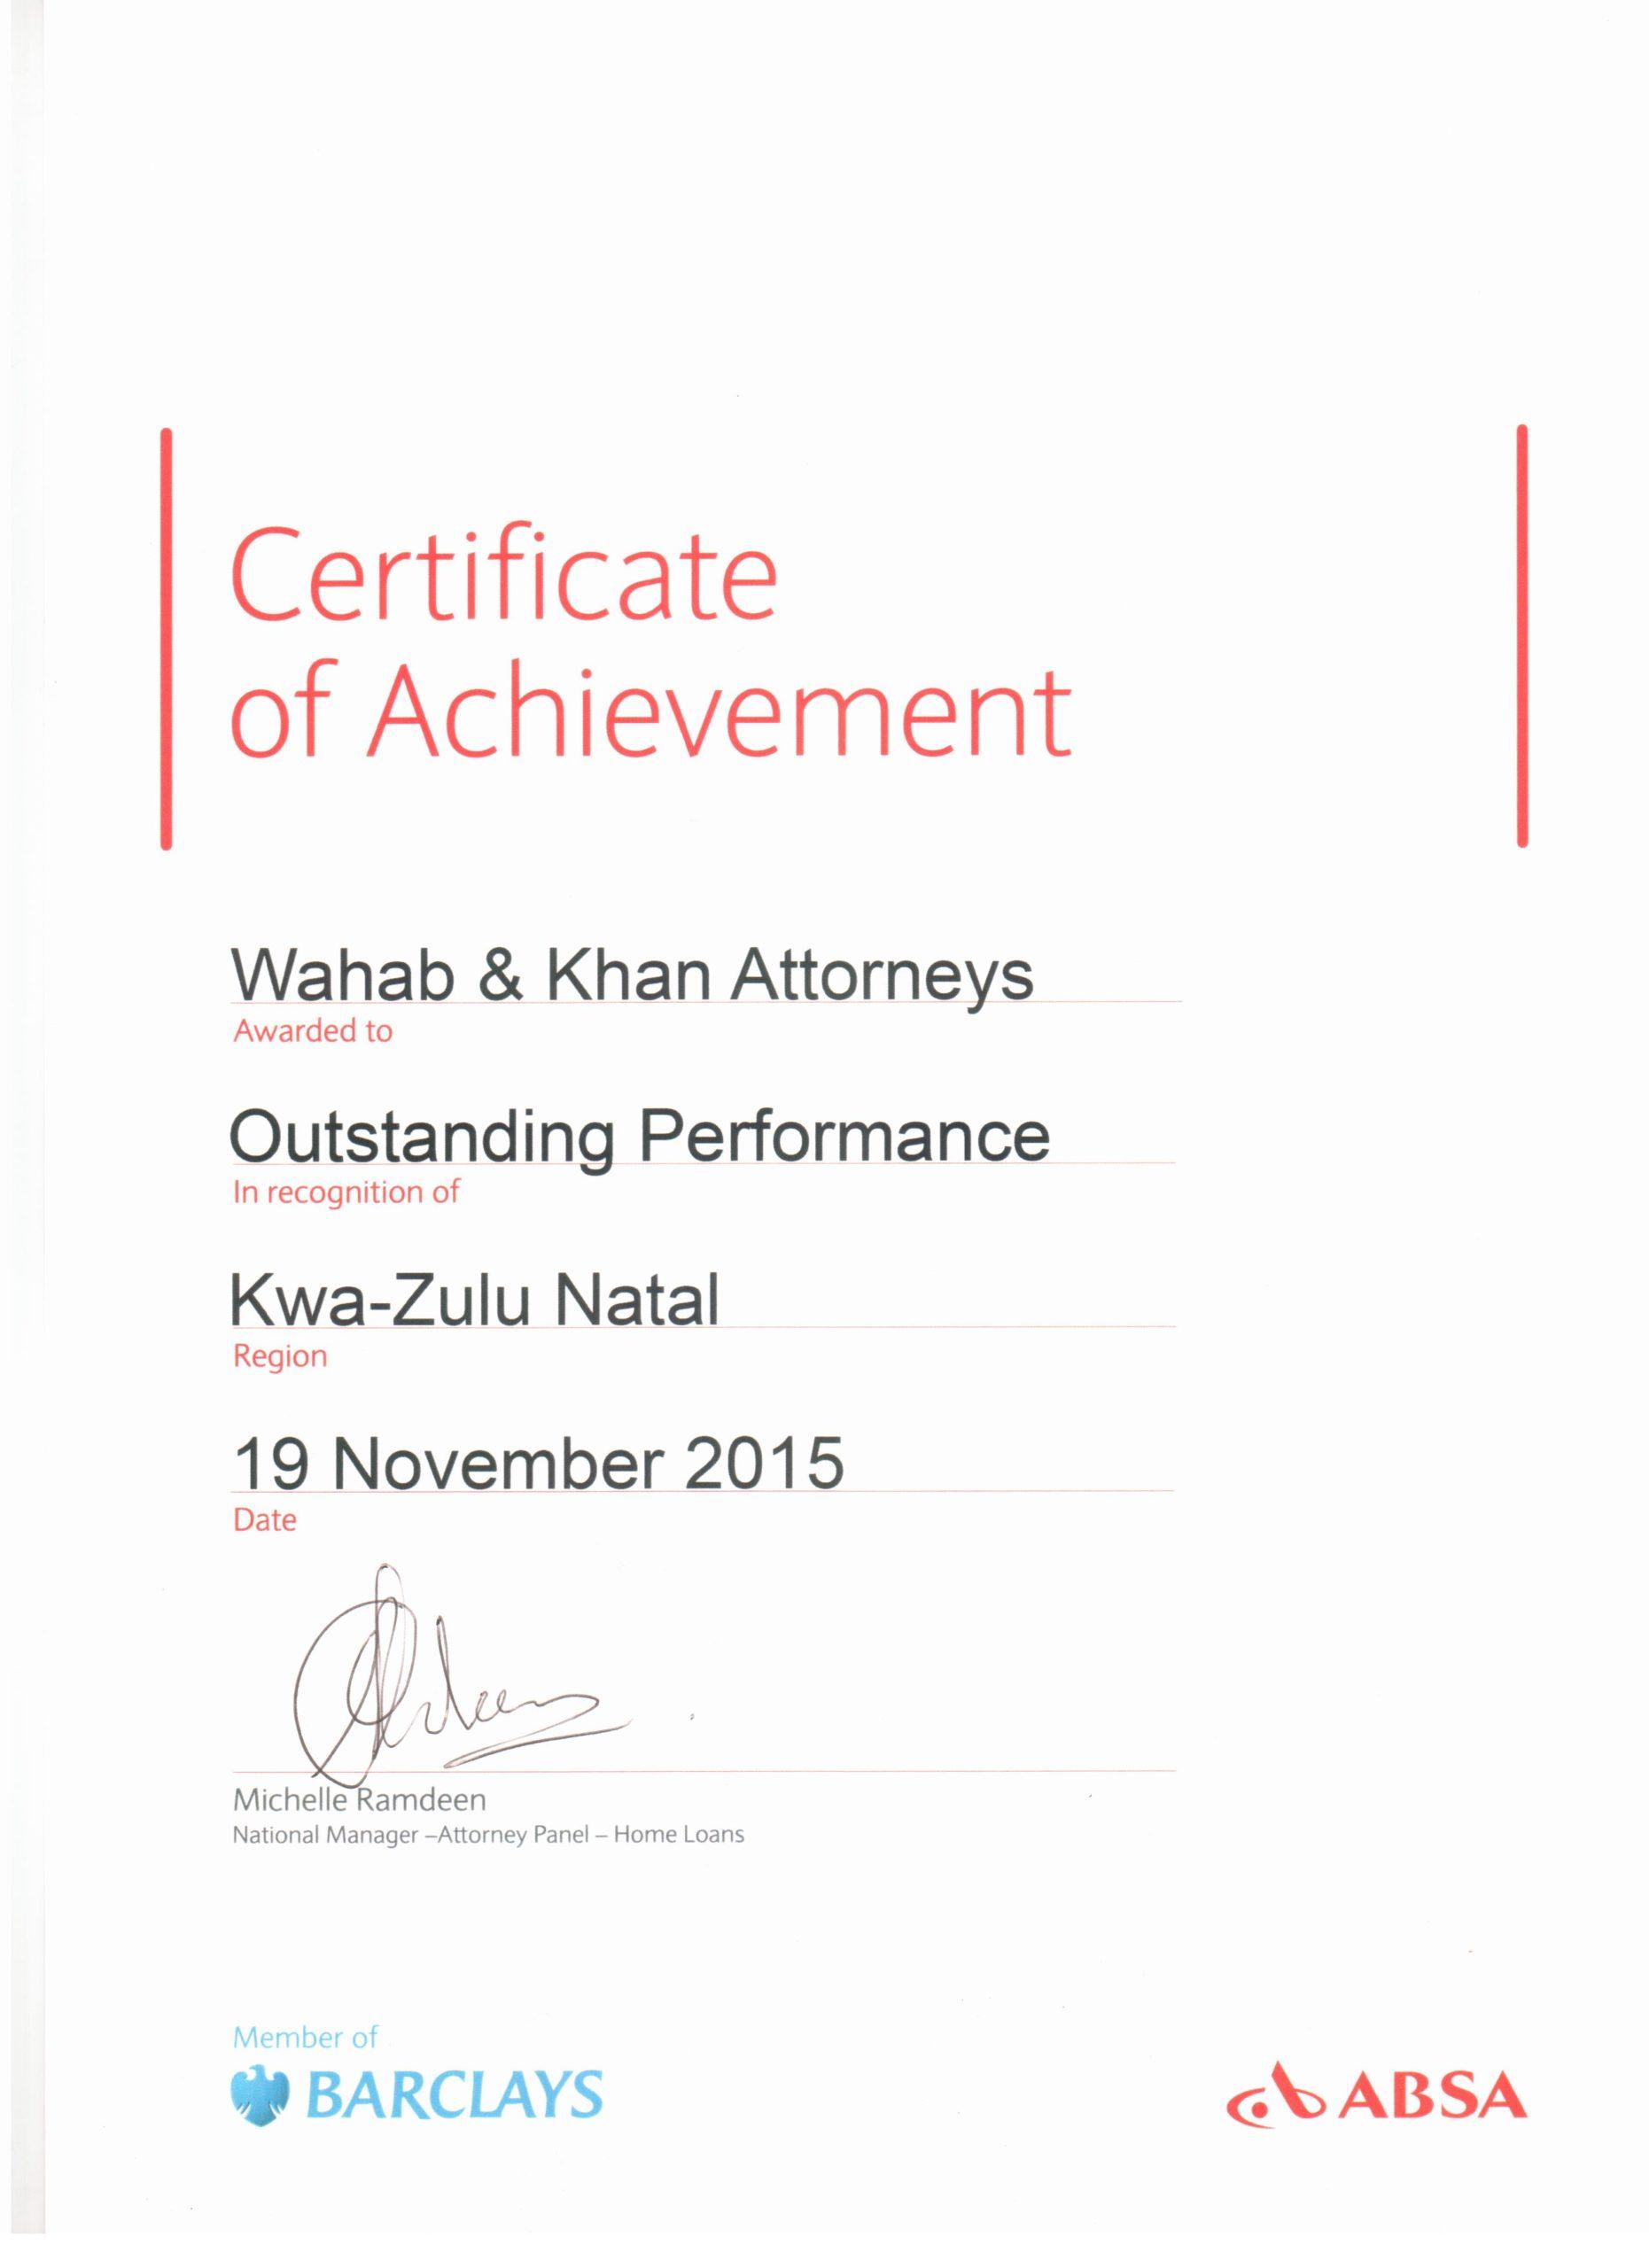 https://wahabkhan.co.za/wp-content/uploads/2021/03/W-K-Cert-of-Achievement-2-001-scaled.jpg